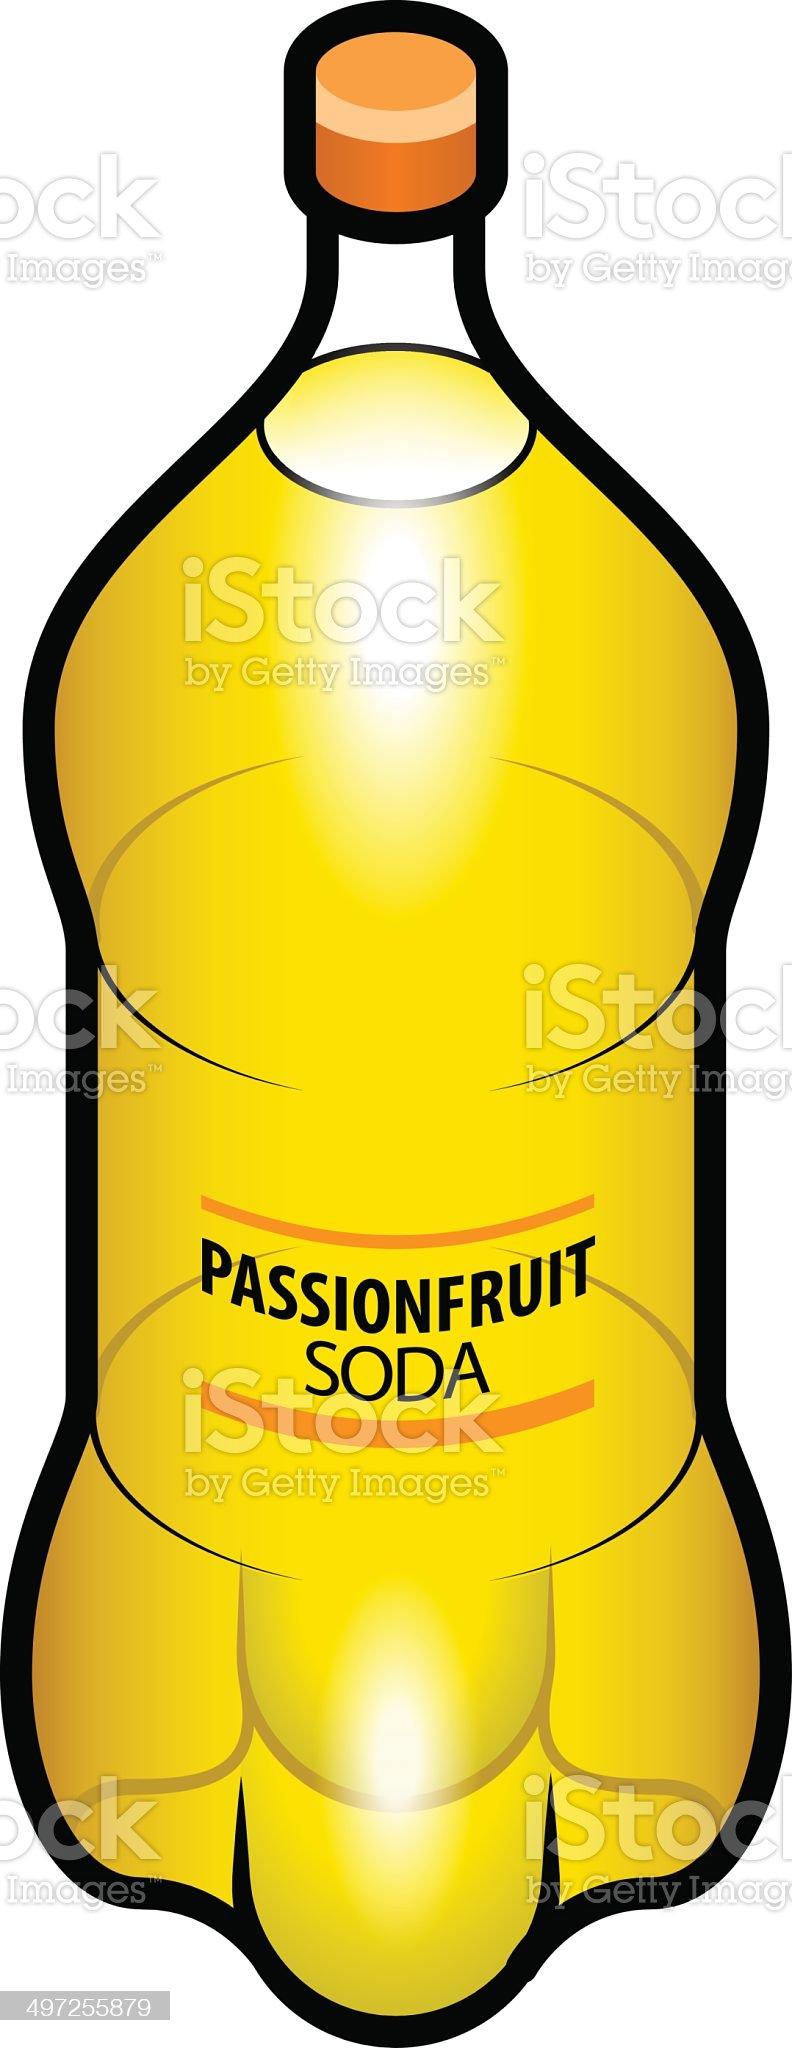 Passionfruit Soda royalty-free stock vector art